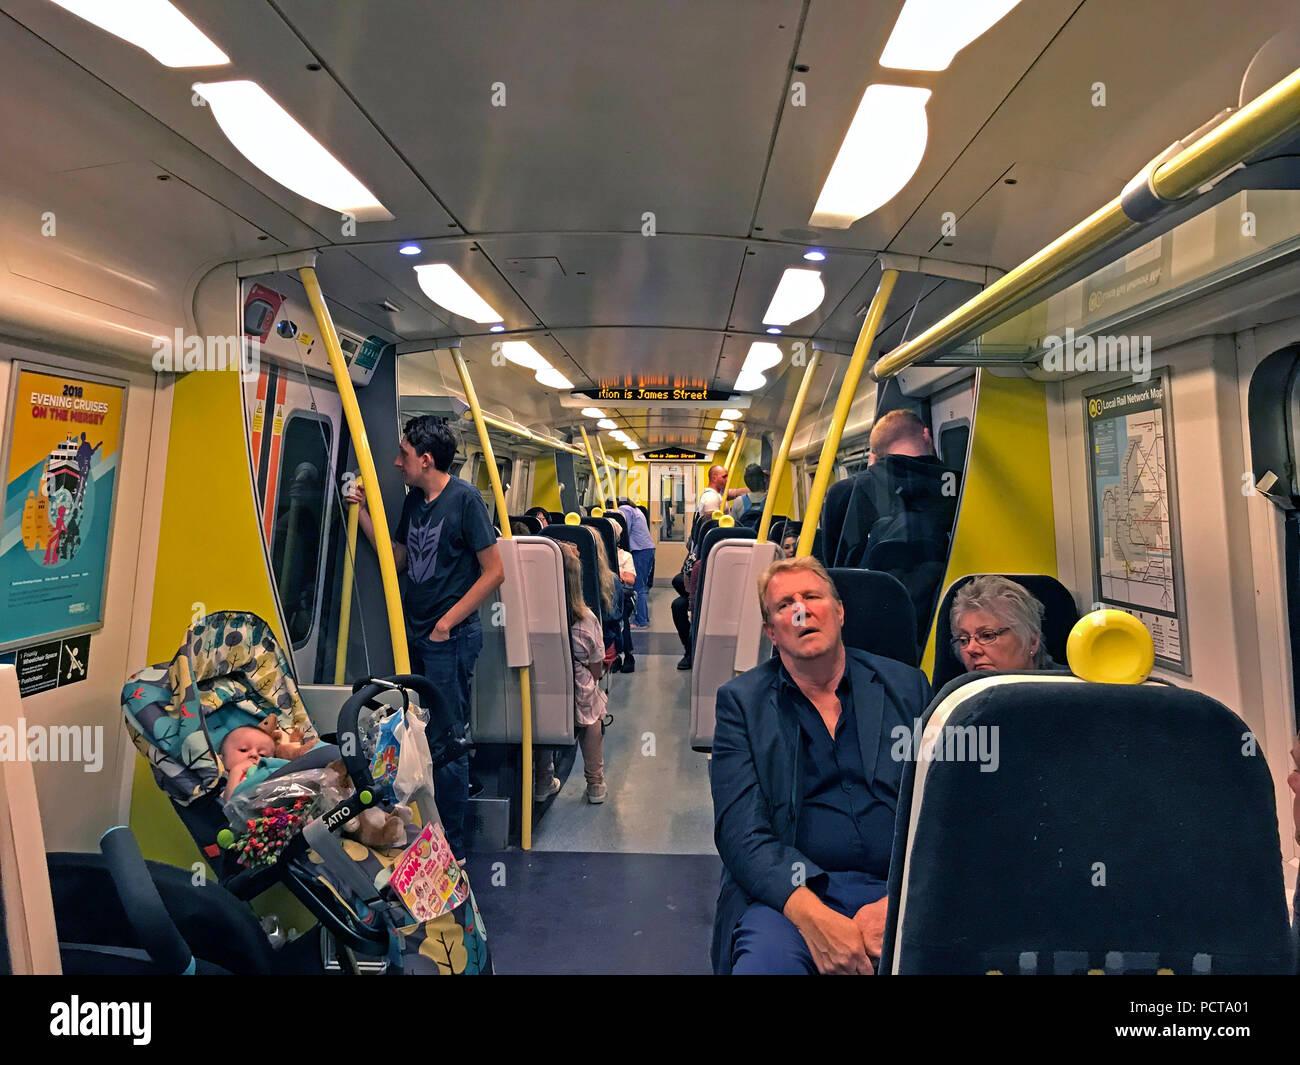 GoTonySmith,@HotpixUK,City Centre,inside,passengers,passenger,pushchair,push chair,Interior of a Merseyrail Wirral Line Train,Merseyside,North West England,UK,Interior,Wirral,Transport,Train,City,Region,North West,England,regional,railway,TOC,Train Operating Company,BR,subway,Liverpool underground,Serco,Abellio,Class 508,EMU,Class508,Class507,Class 507,Wirral Peninsula,Peninsula,Merseyrail Electrics 2002 Ltd,Merseyrail Electrics